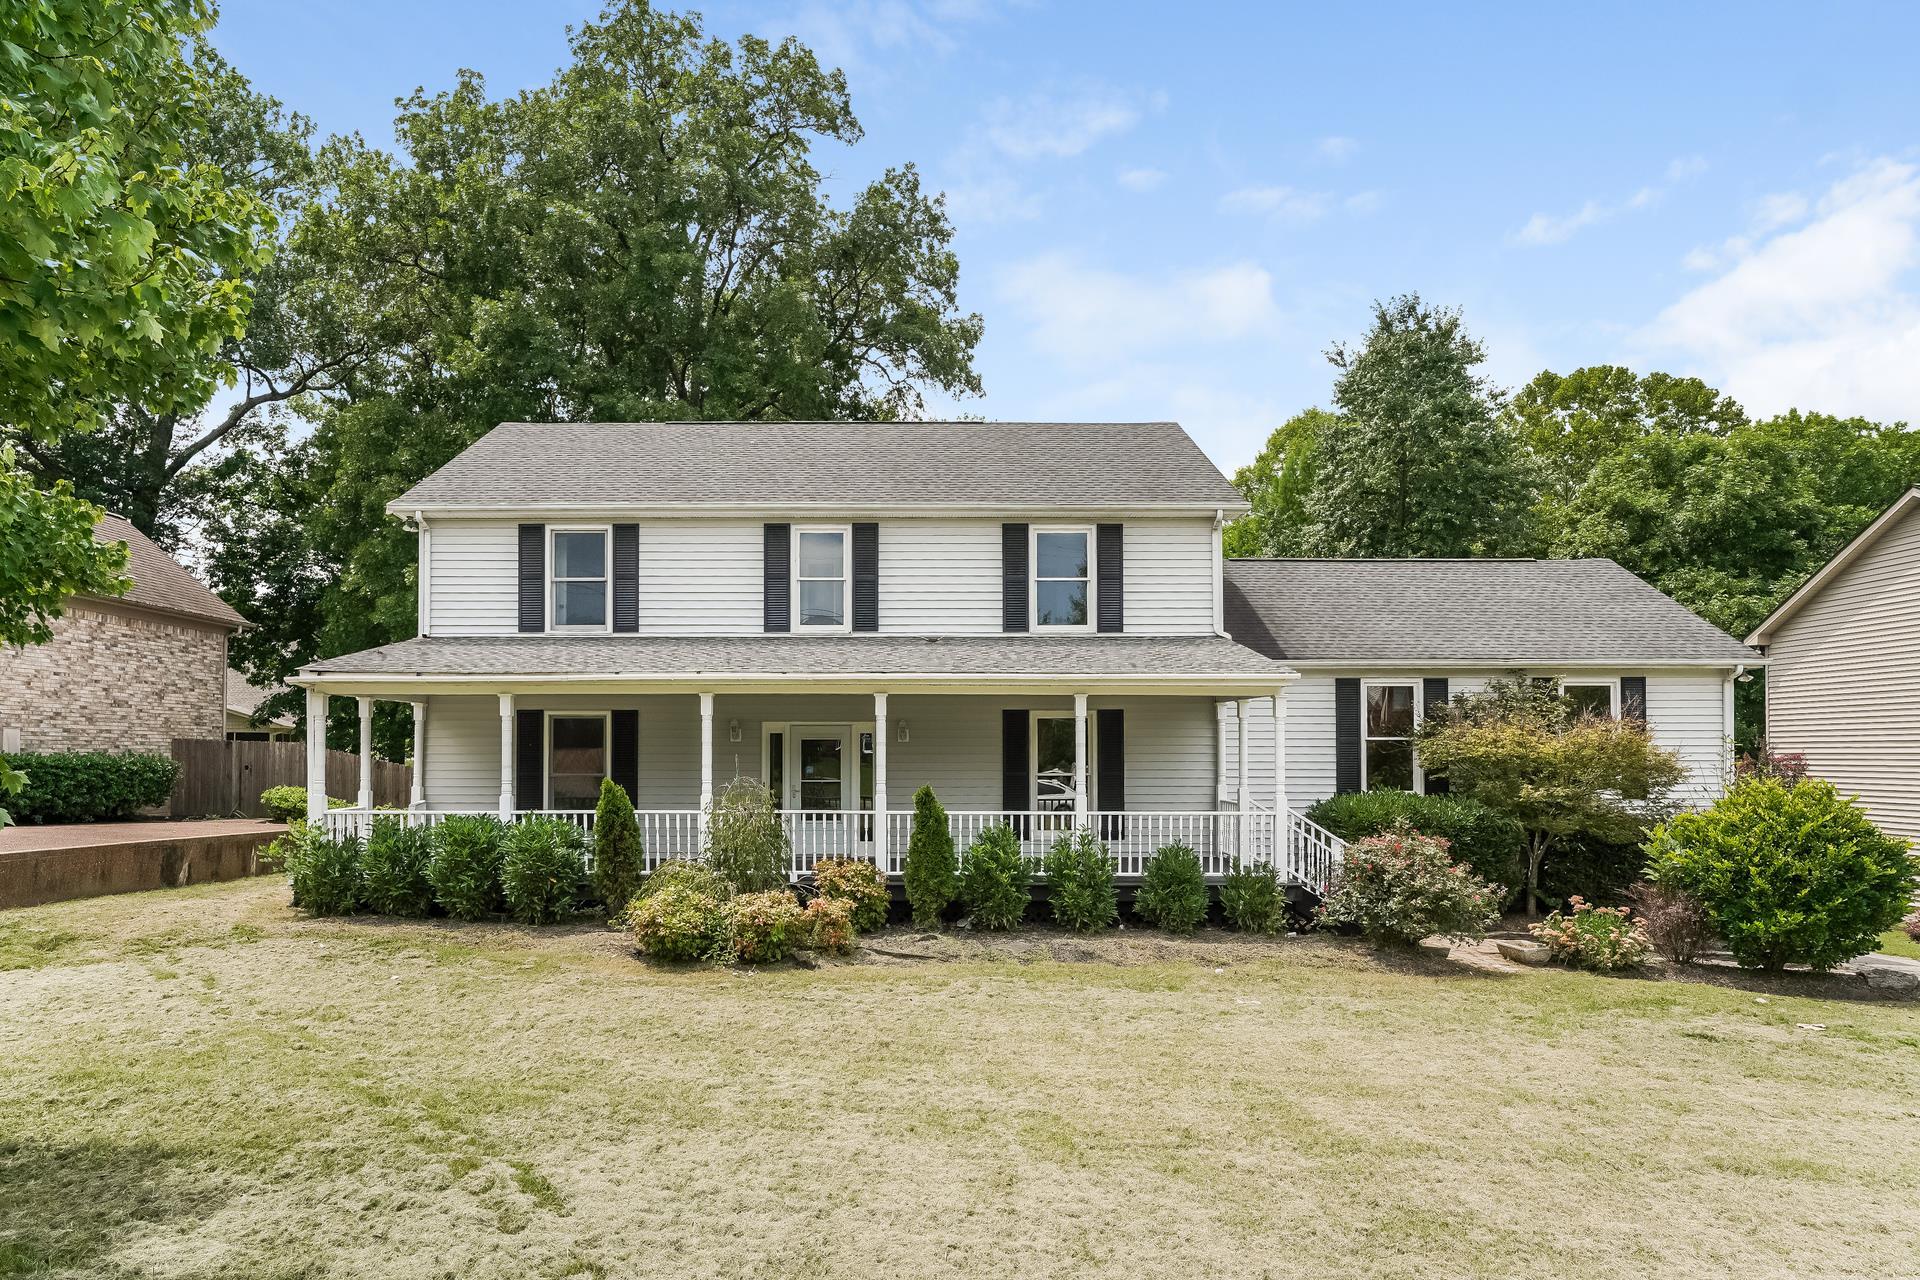 1016 Brookstone Blvd, Mount Juliet, TN 37122 - Mount Juliet, TN real estate listing